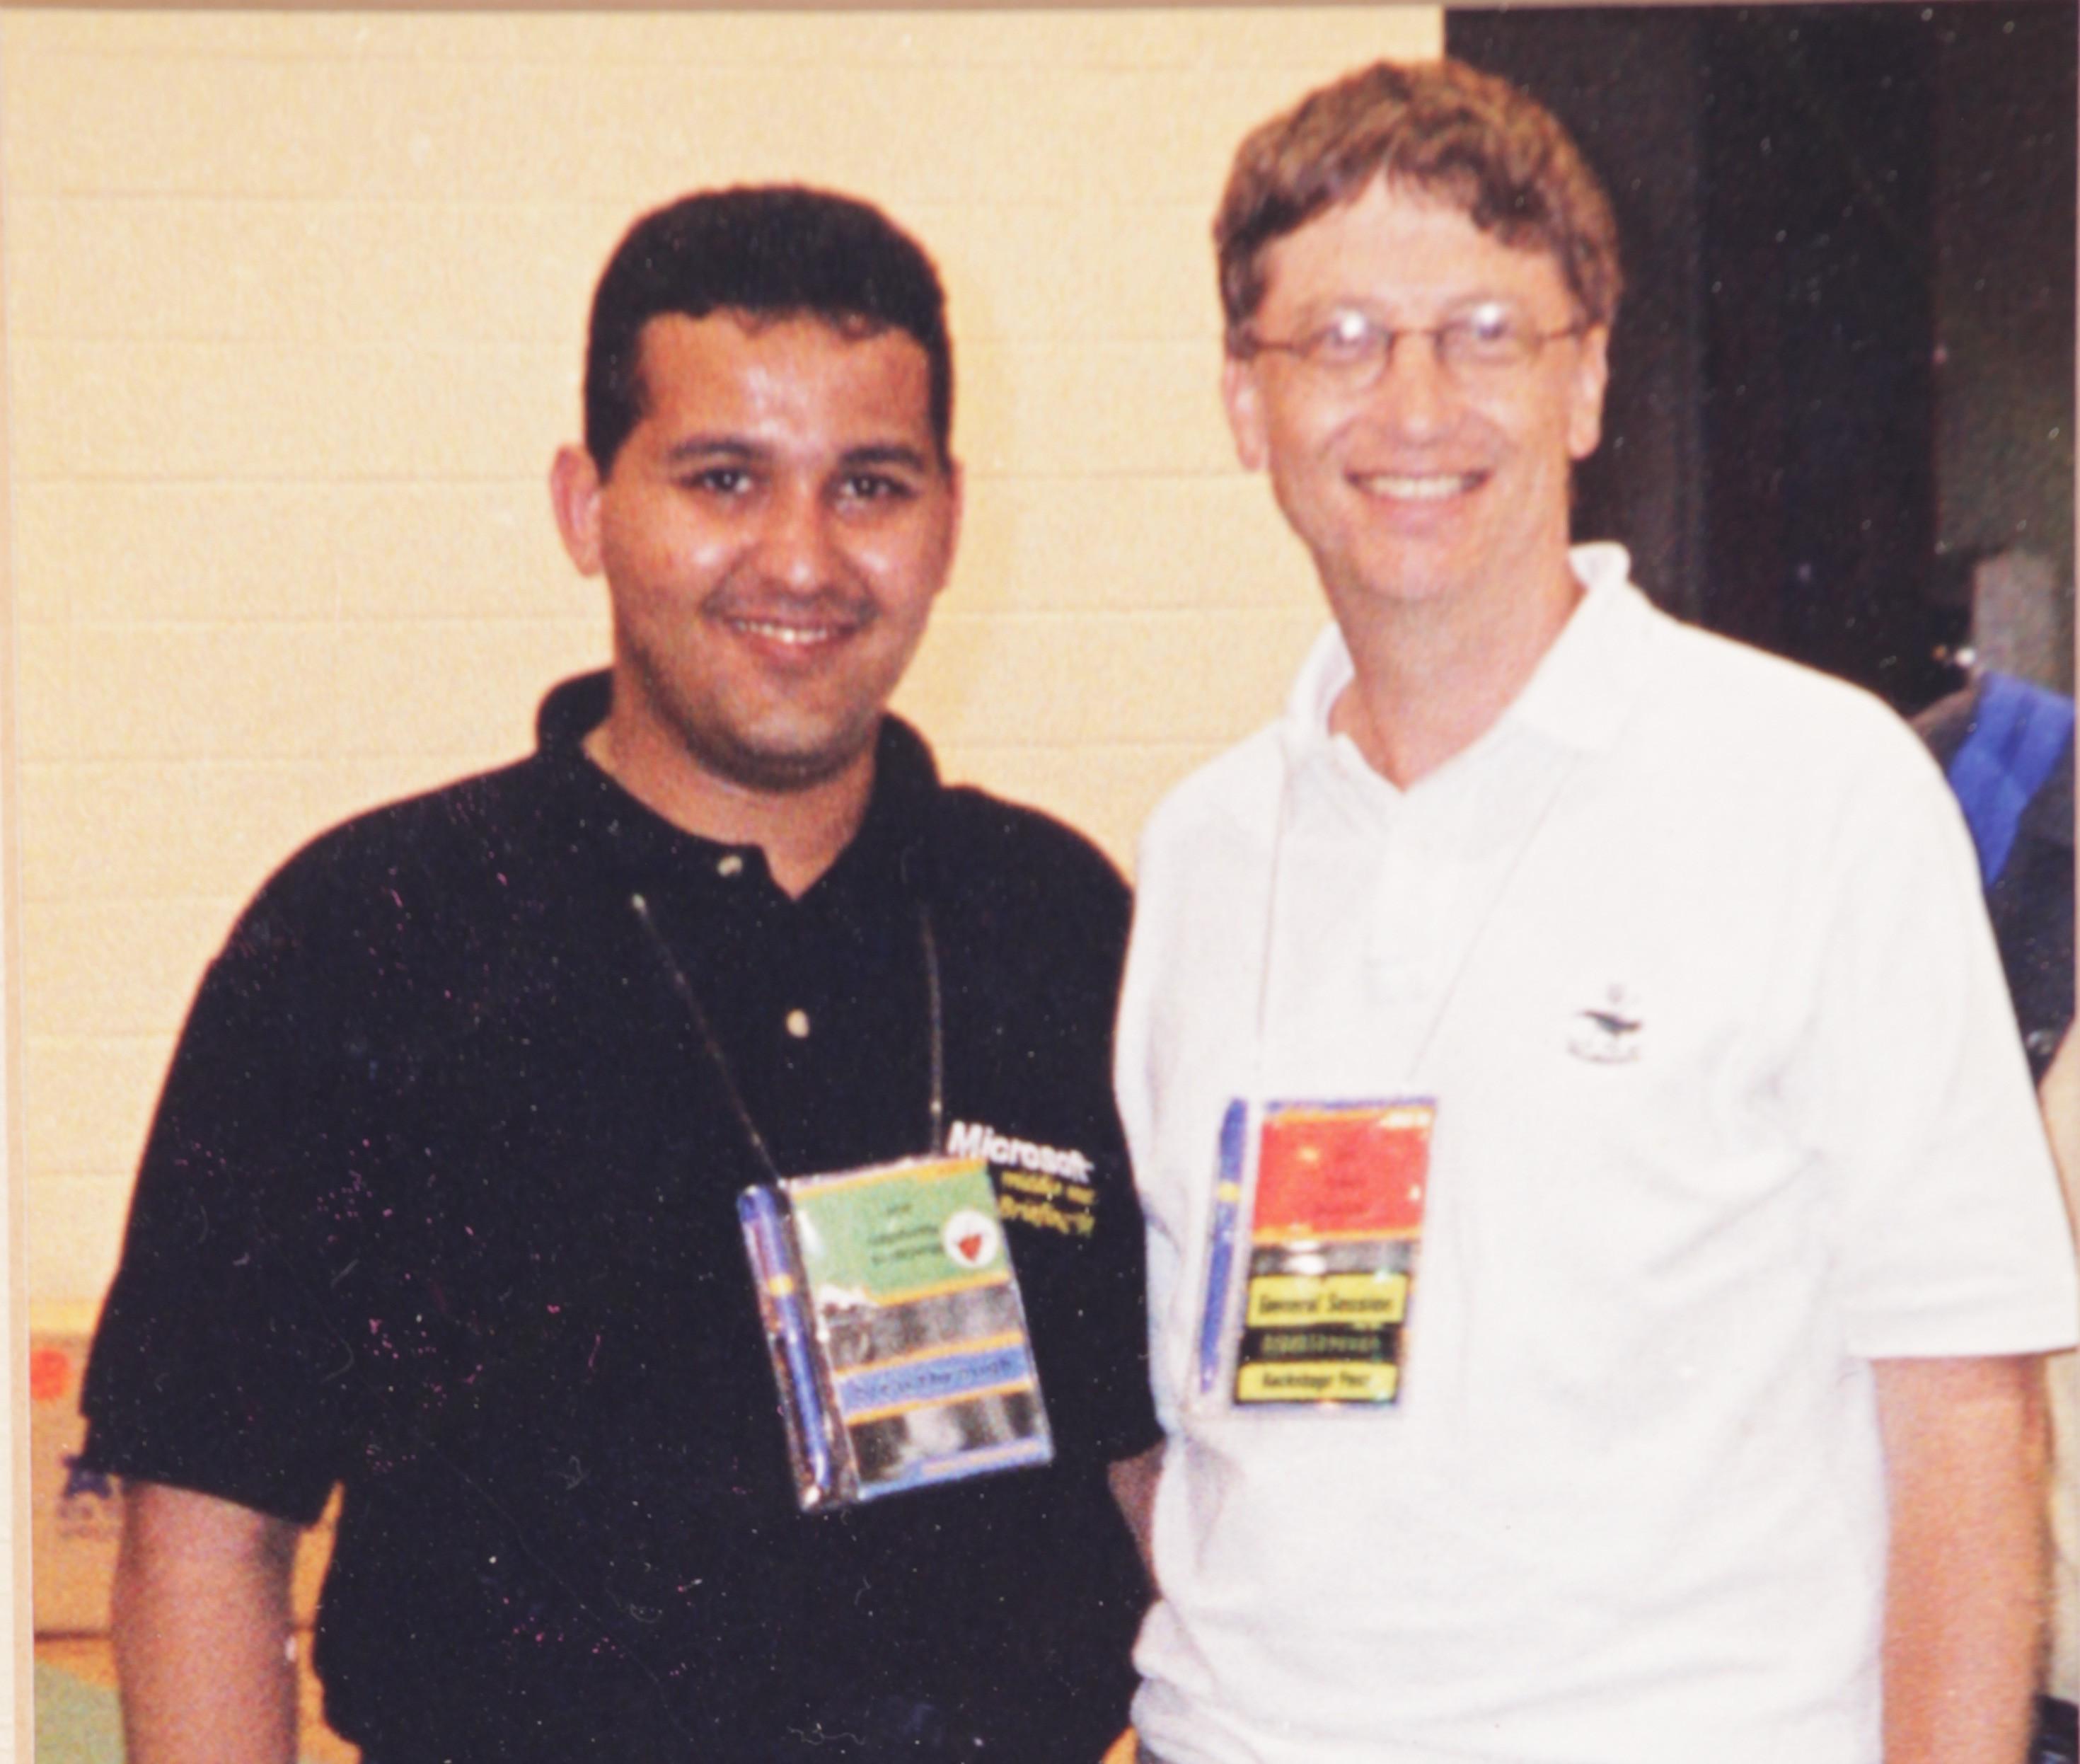 Mustapha Ramadan with Bill Gates